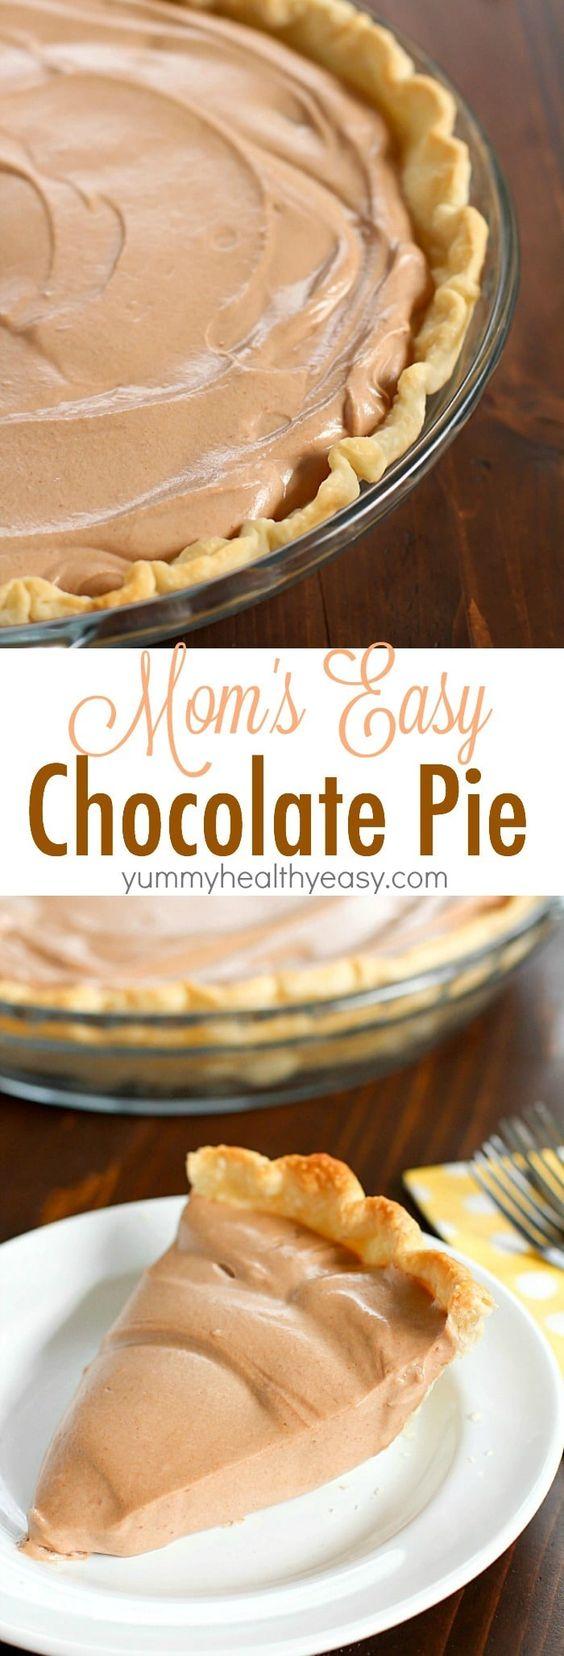 Thanksgiving Desserts: Easy Chocolate Pie Recipe